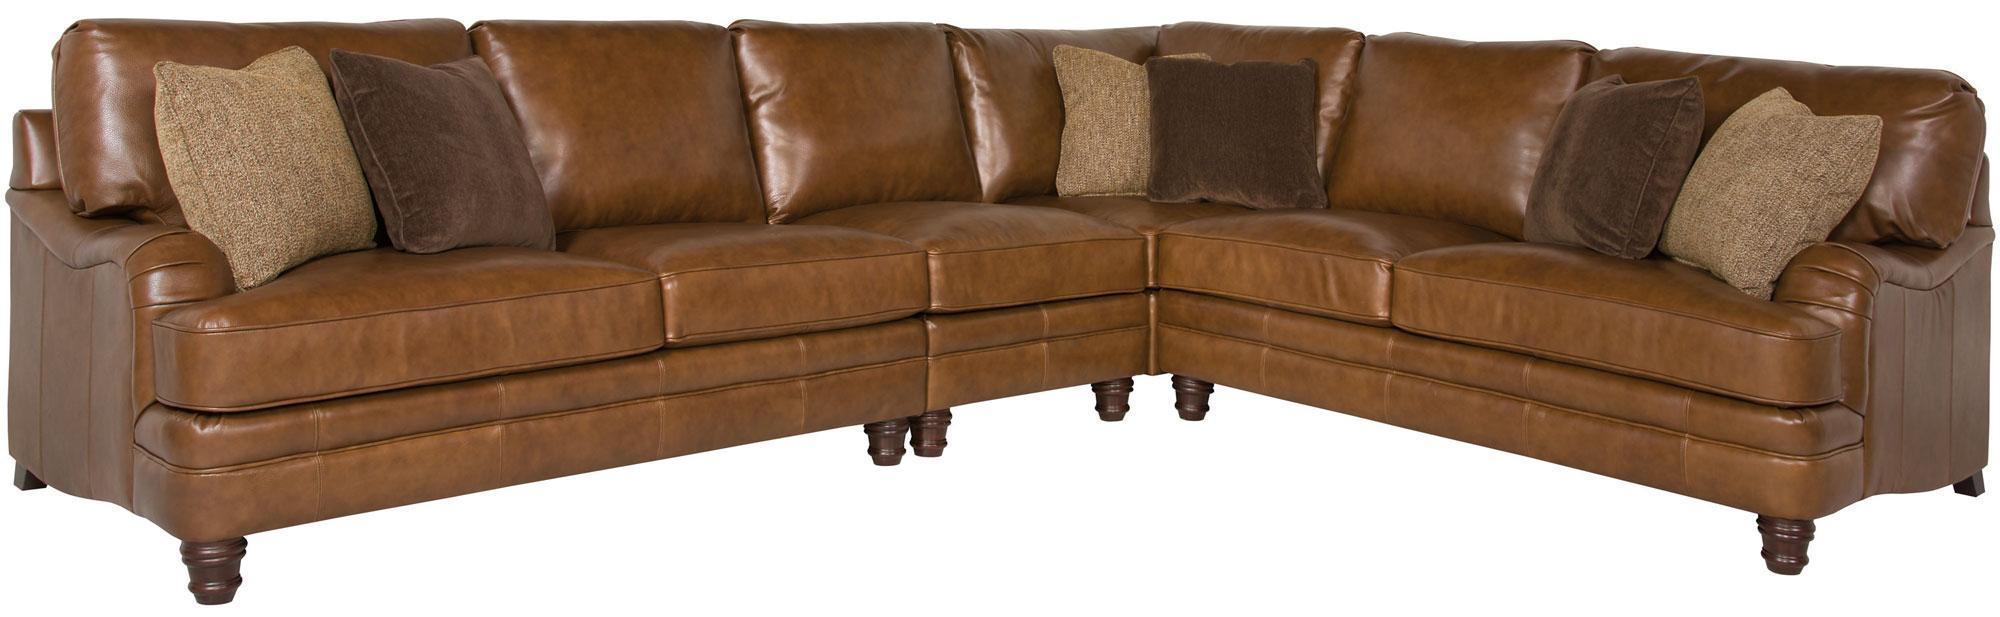 Sectional Sofa | Bernhardt Inside Bernhardt Tarleton Sofas (View 12 of 20)